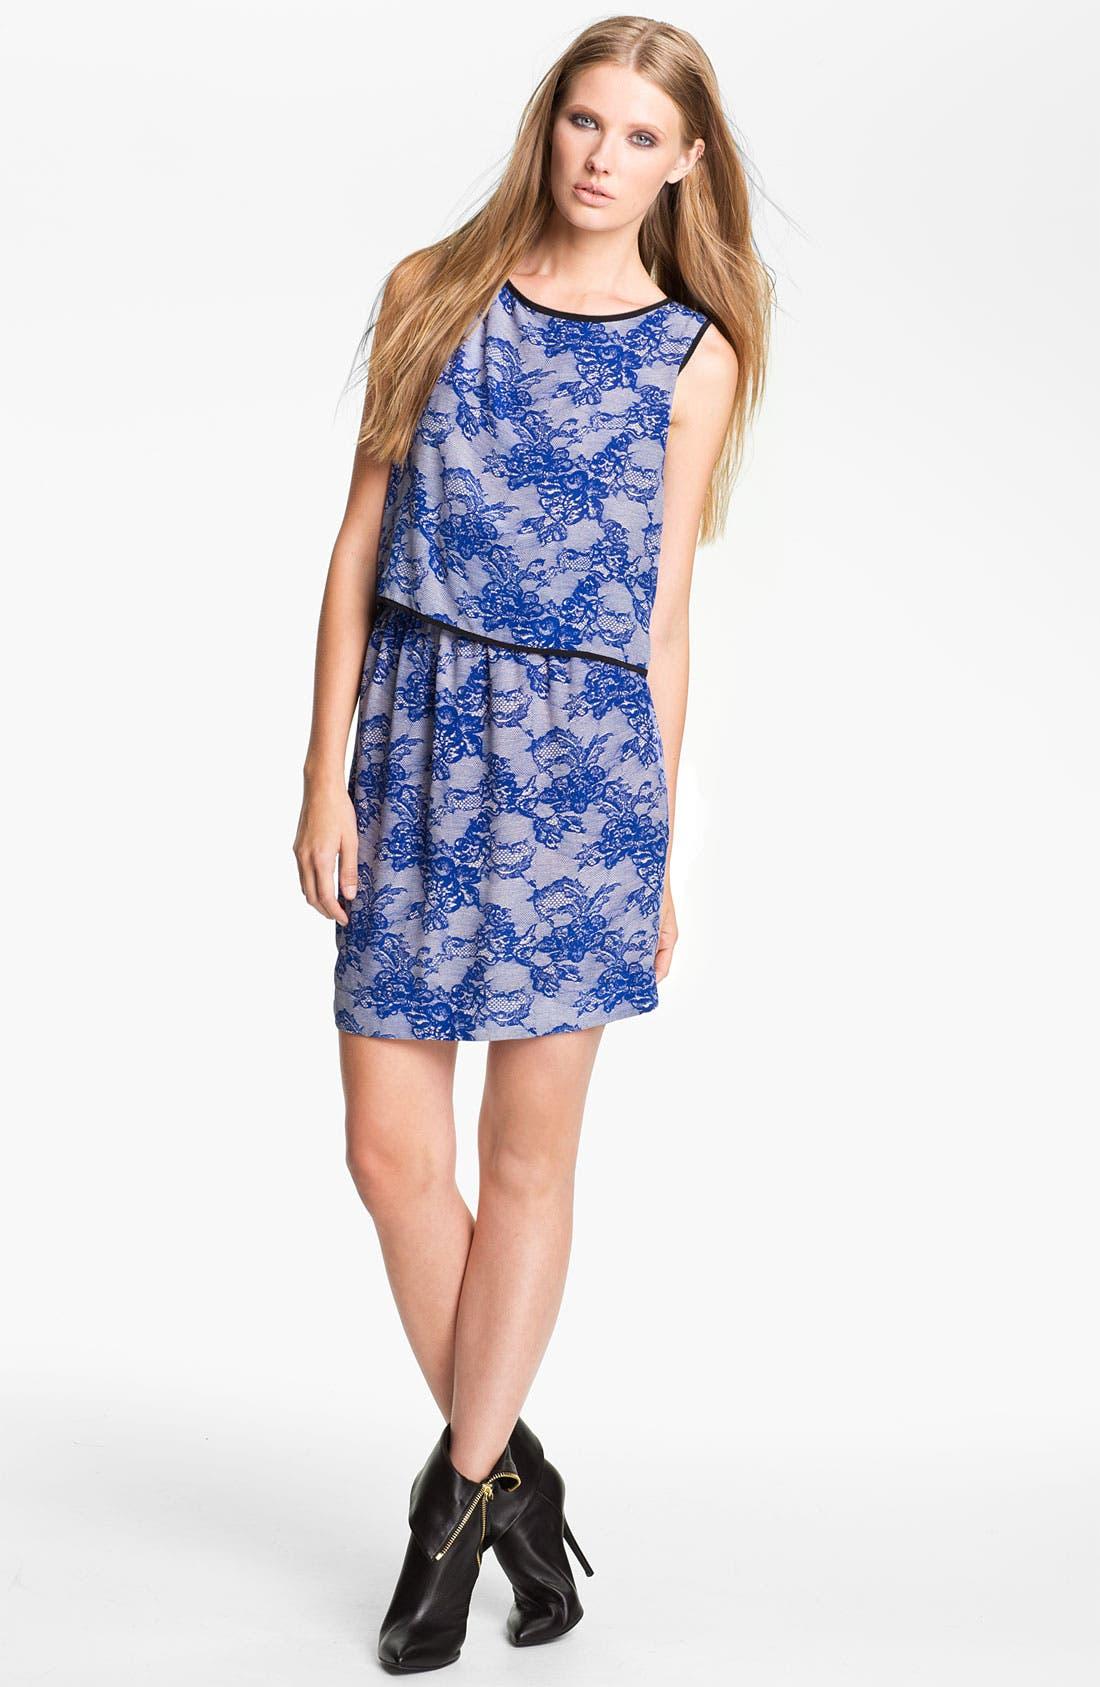 Main Image - Cut25 Lace Print Dress